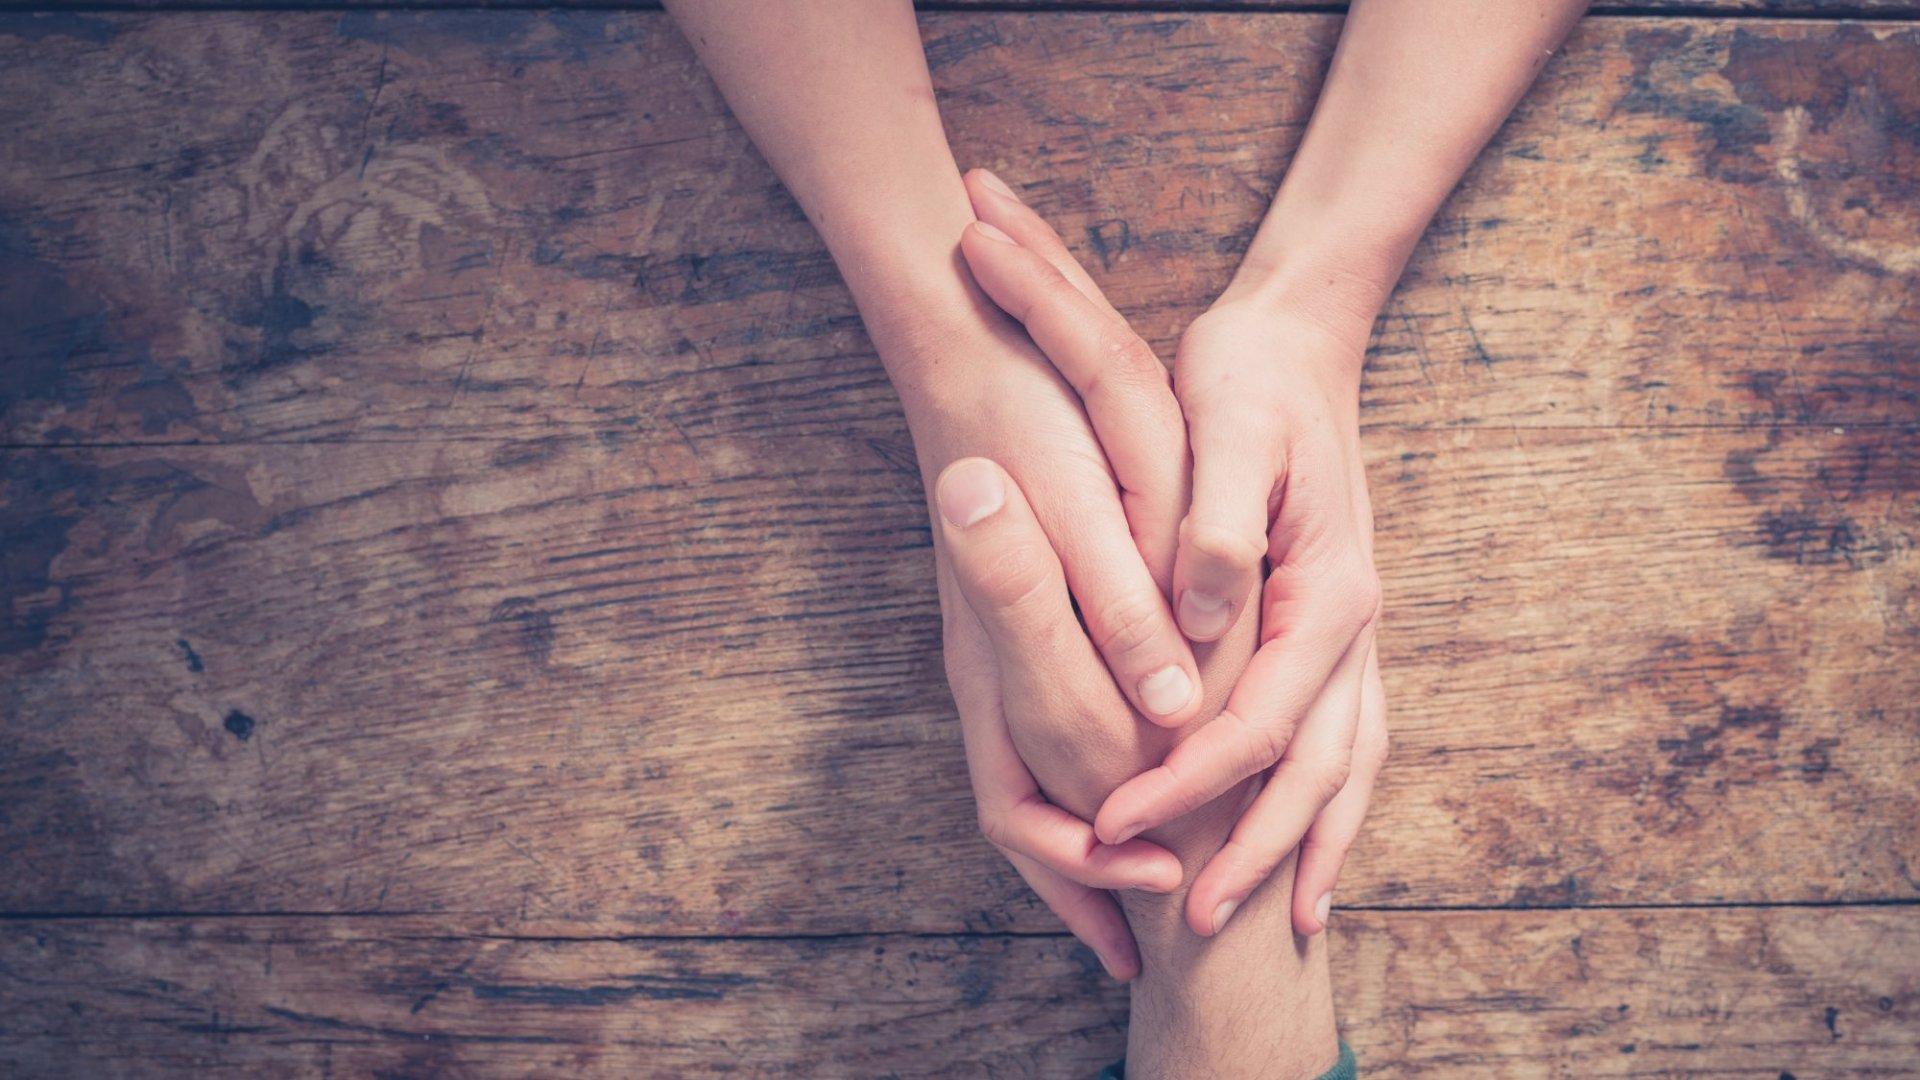 1 Real Reason You Should Make Empathy Your Mantra